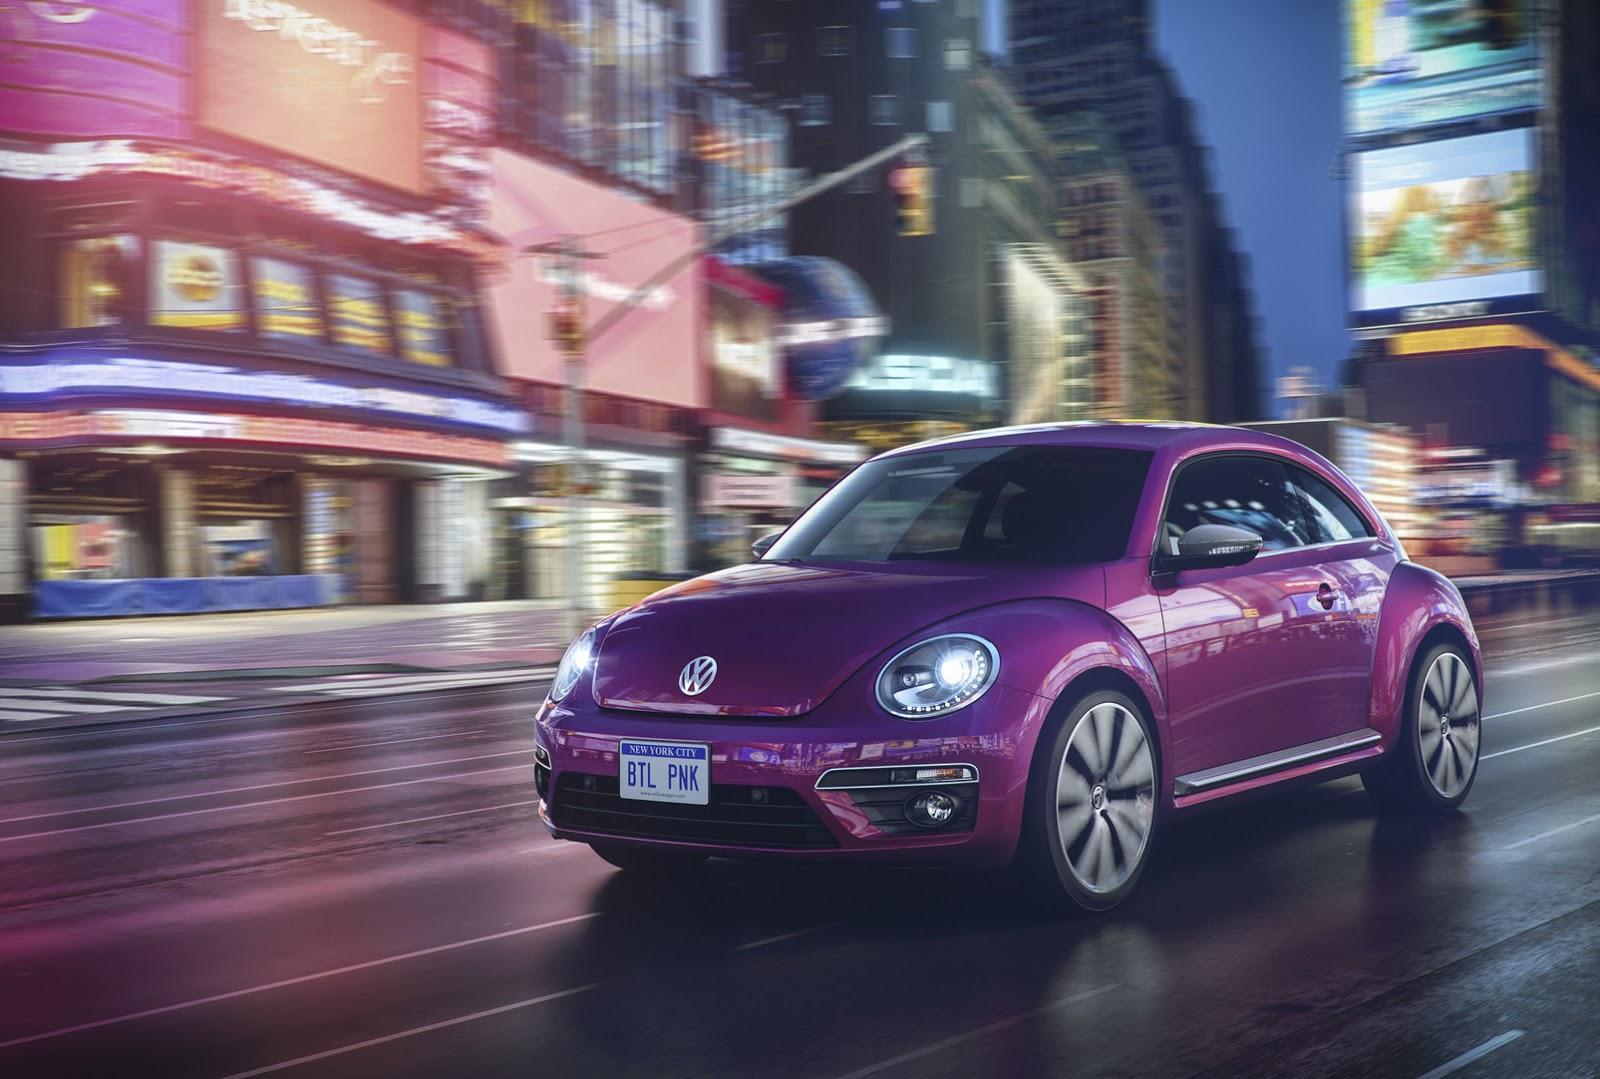 VW Beetle Pink Color Edition Concept